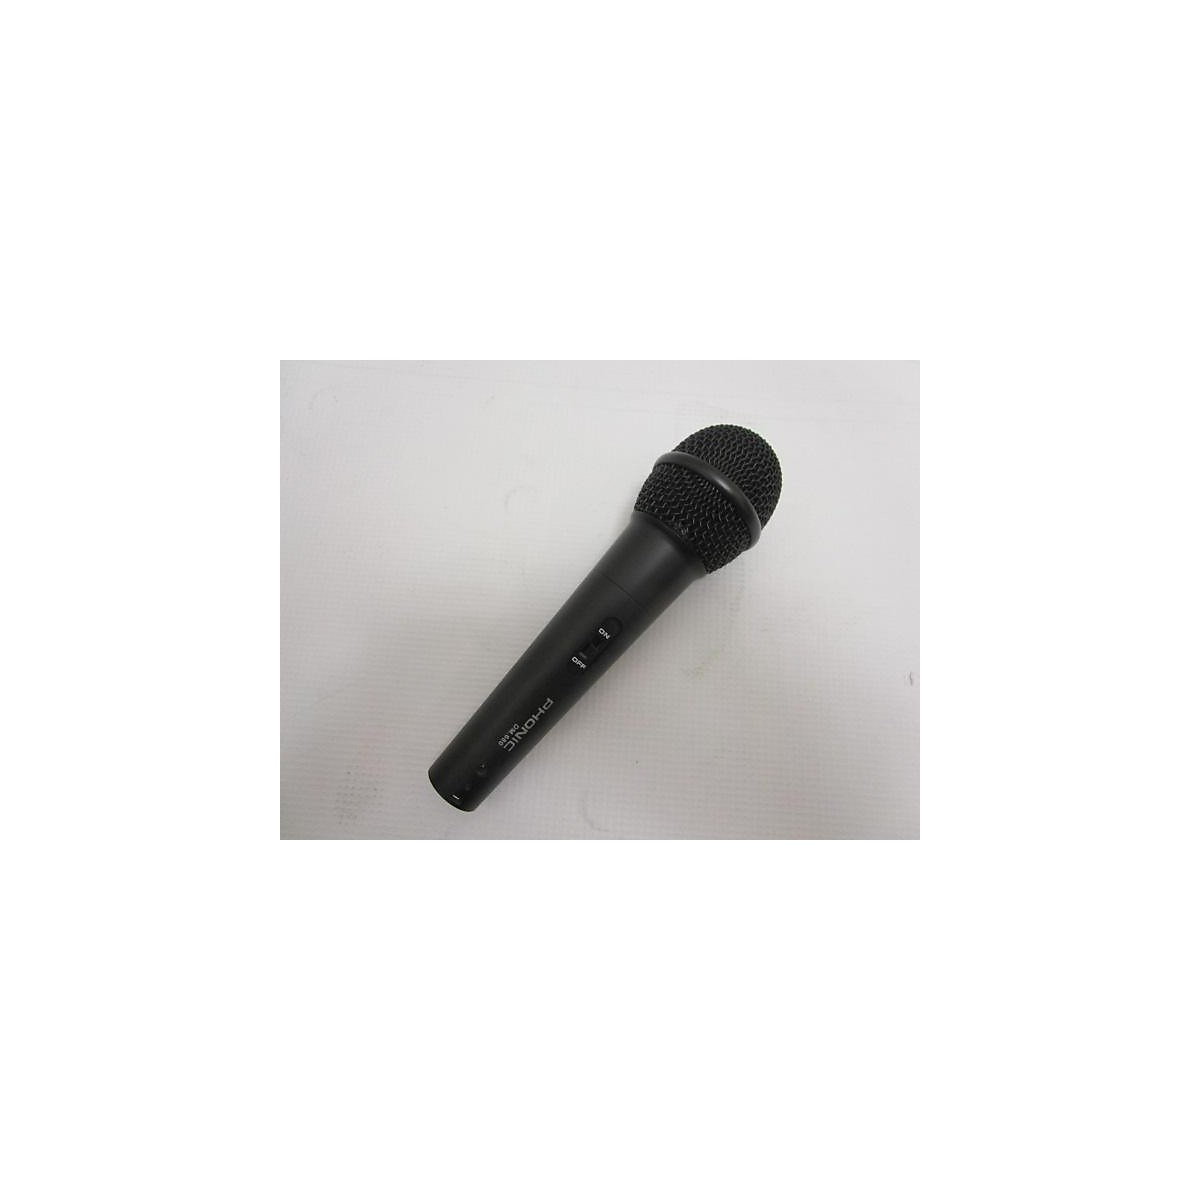 Phonic DM680 Dynamic Microphone